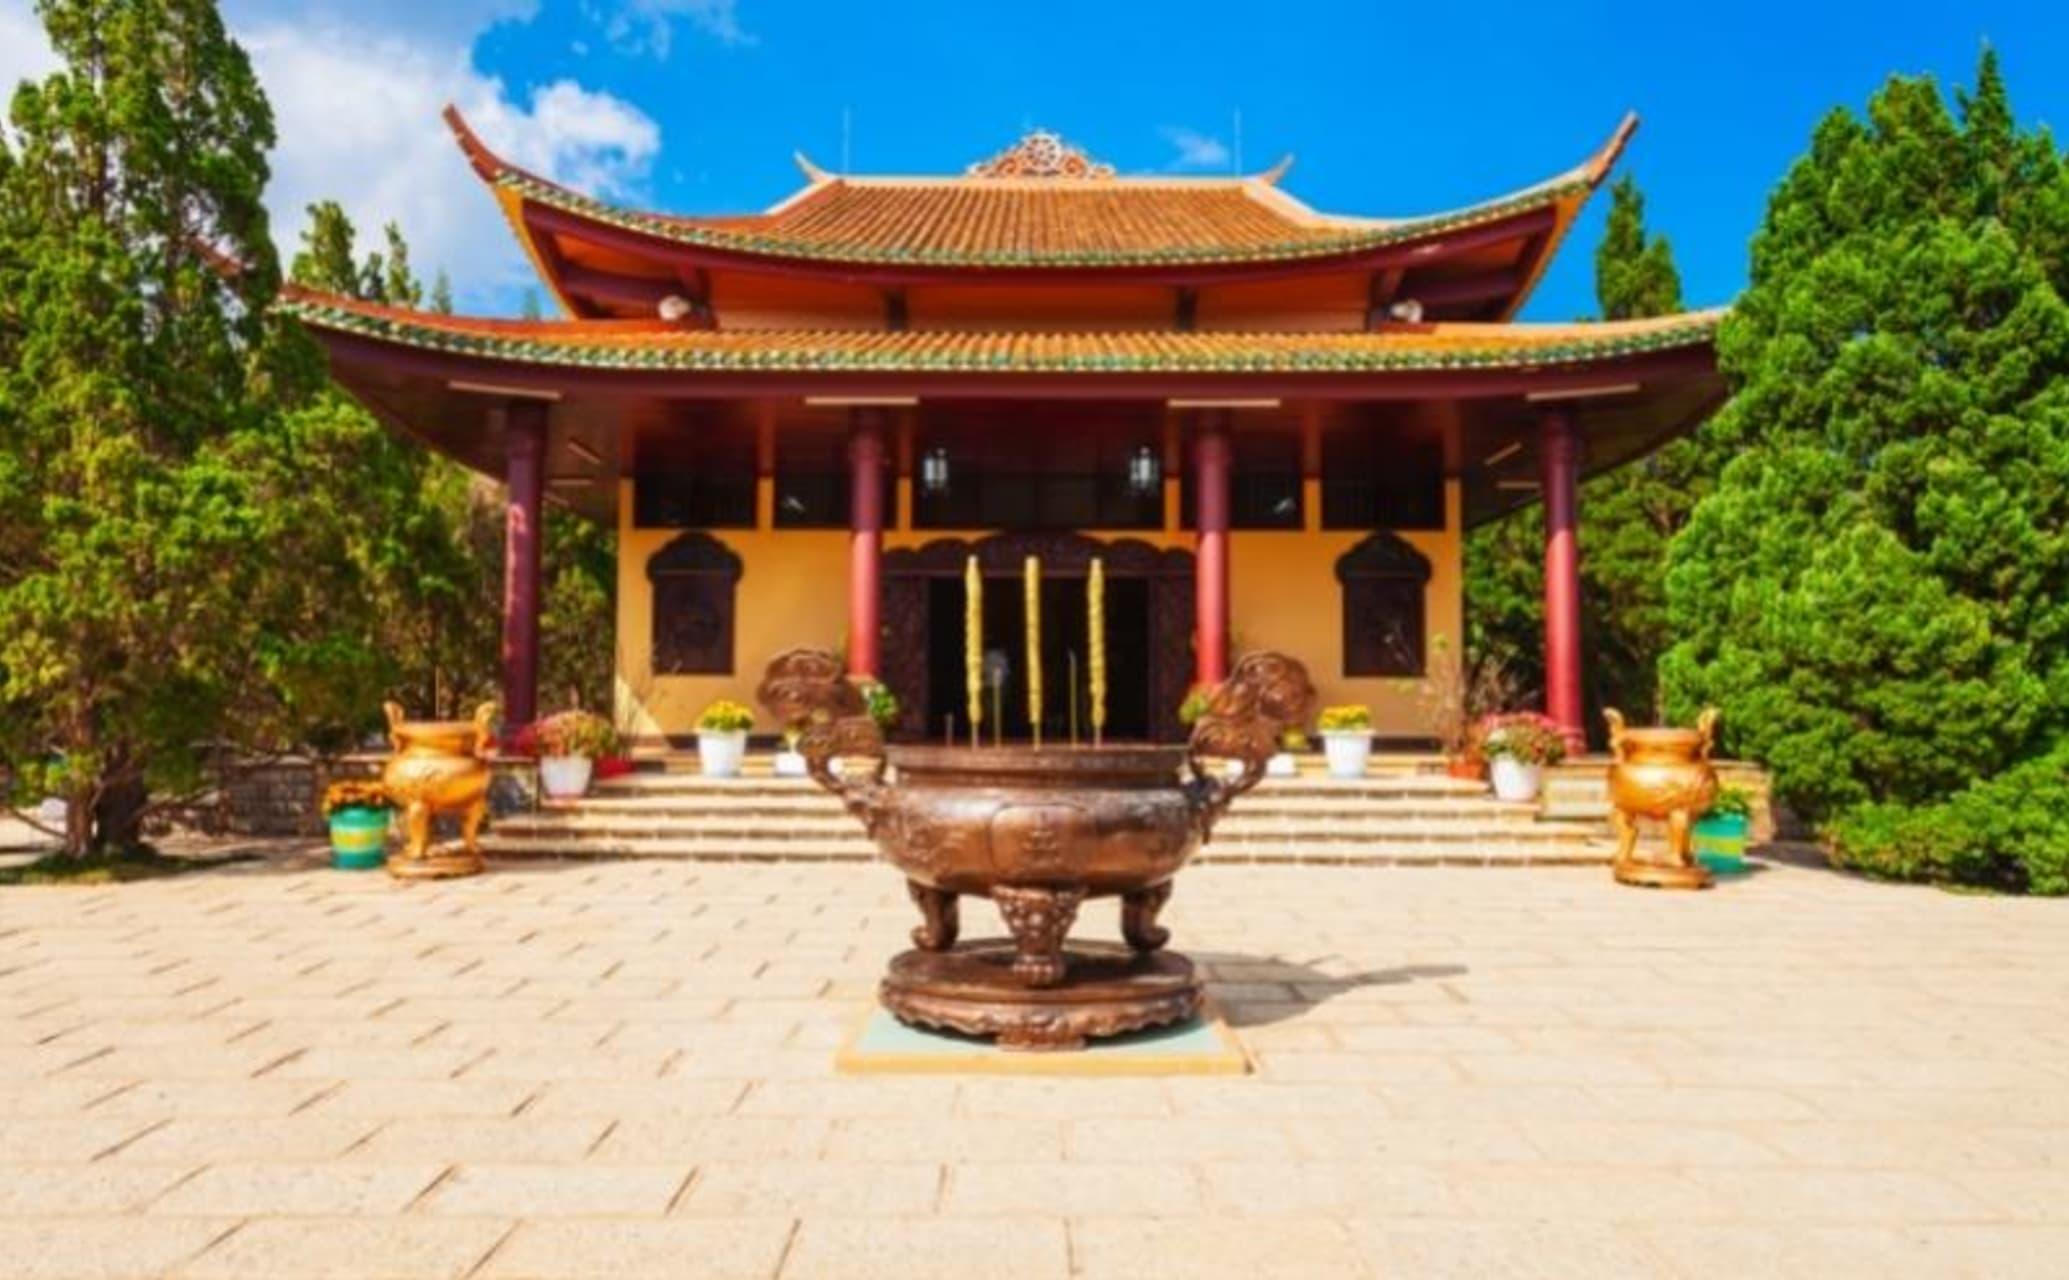 Hue - Hidden Huế - Day 8: The Golden Pagoda